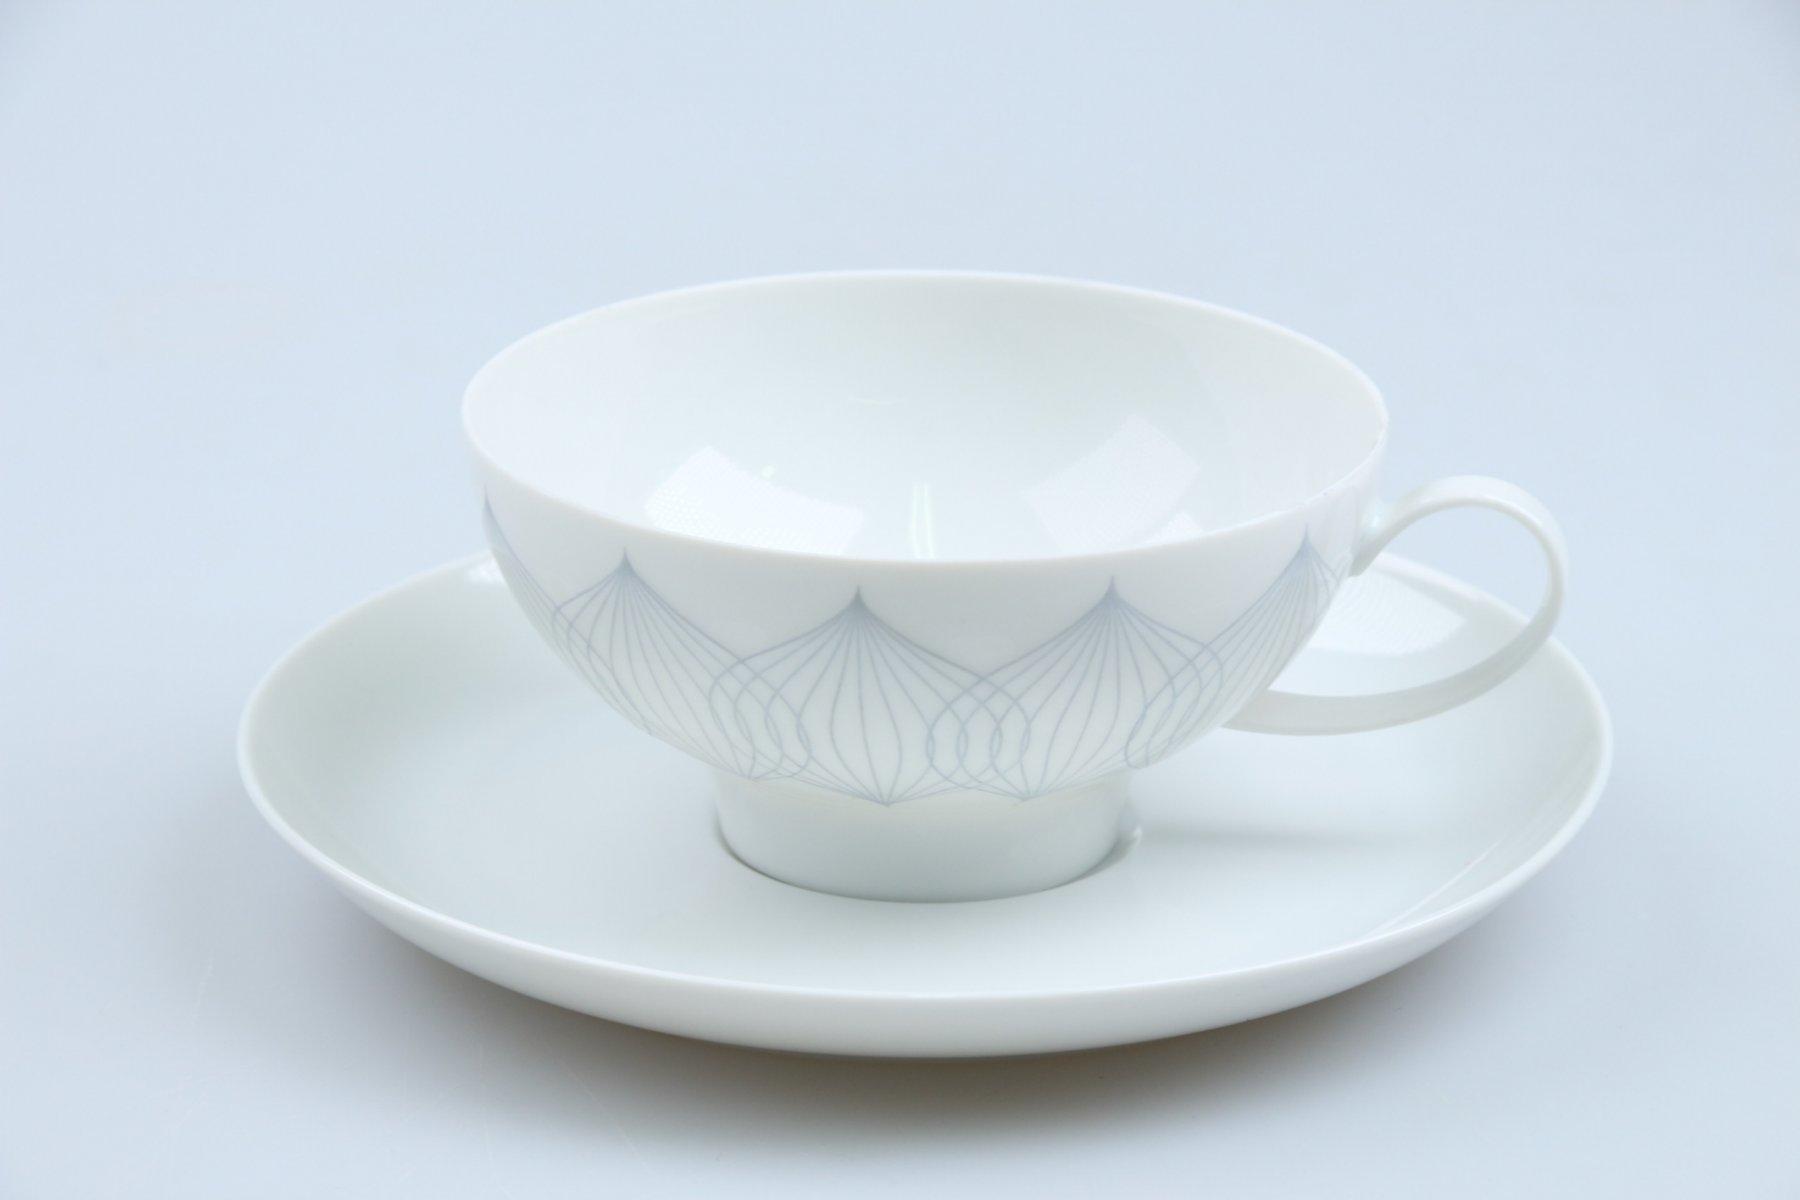 Stövchen für Kaffeekanne D 12,9 cm H 5,1 cm Rosenthal Lotus Kobalt blau